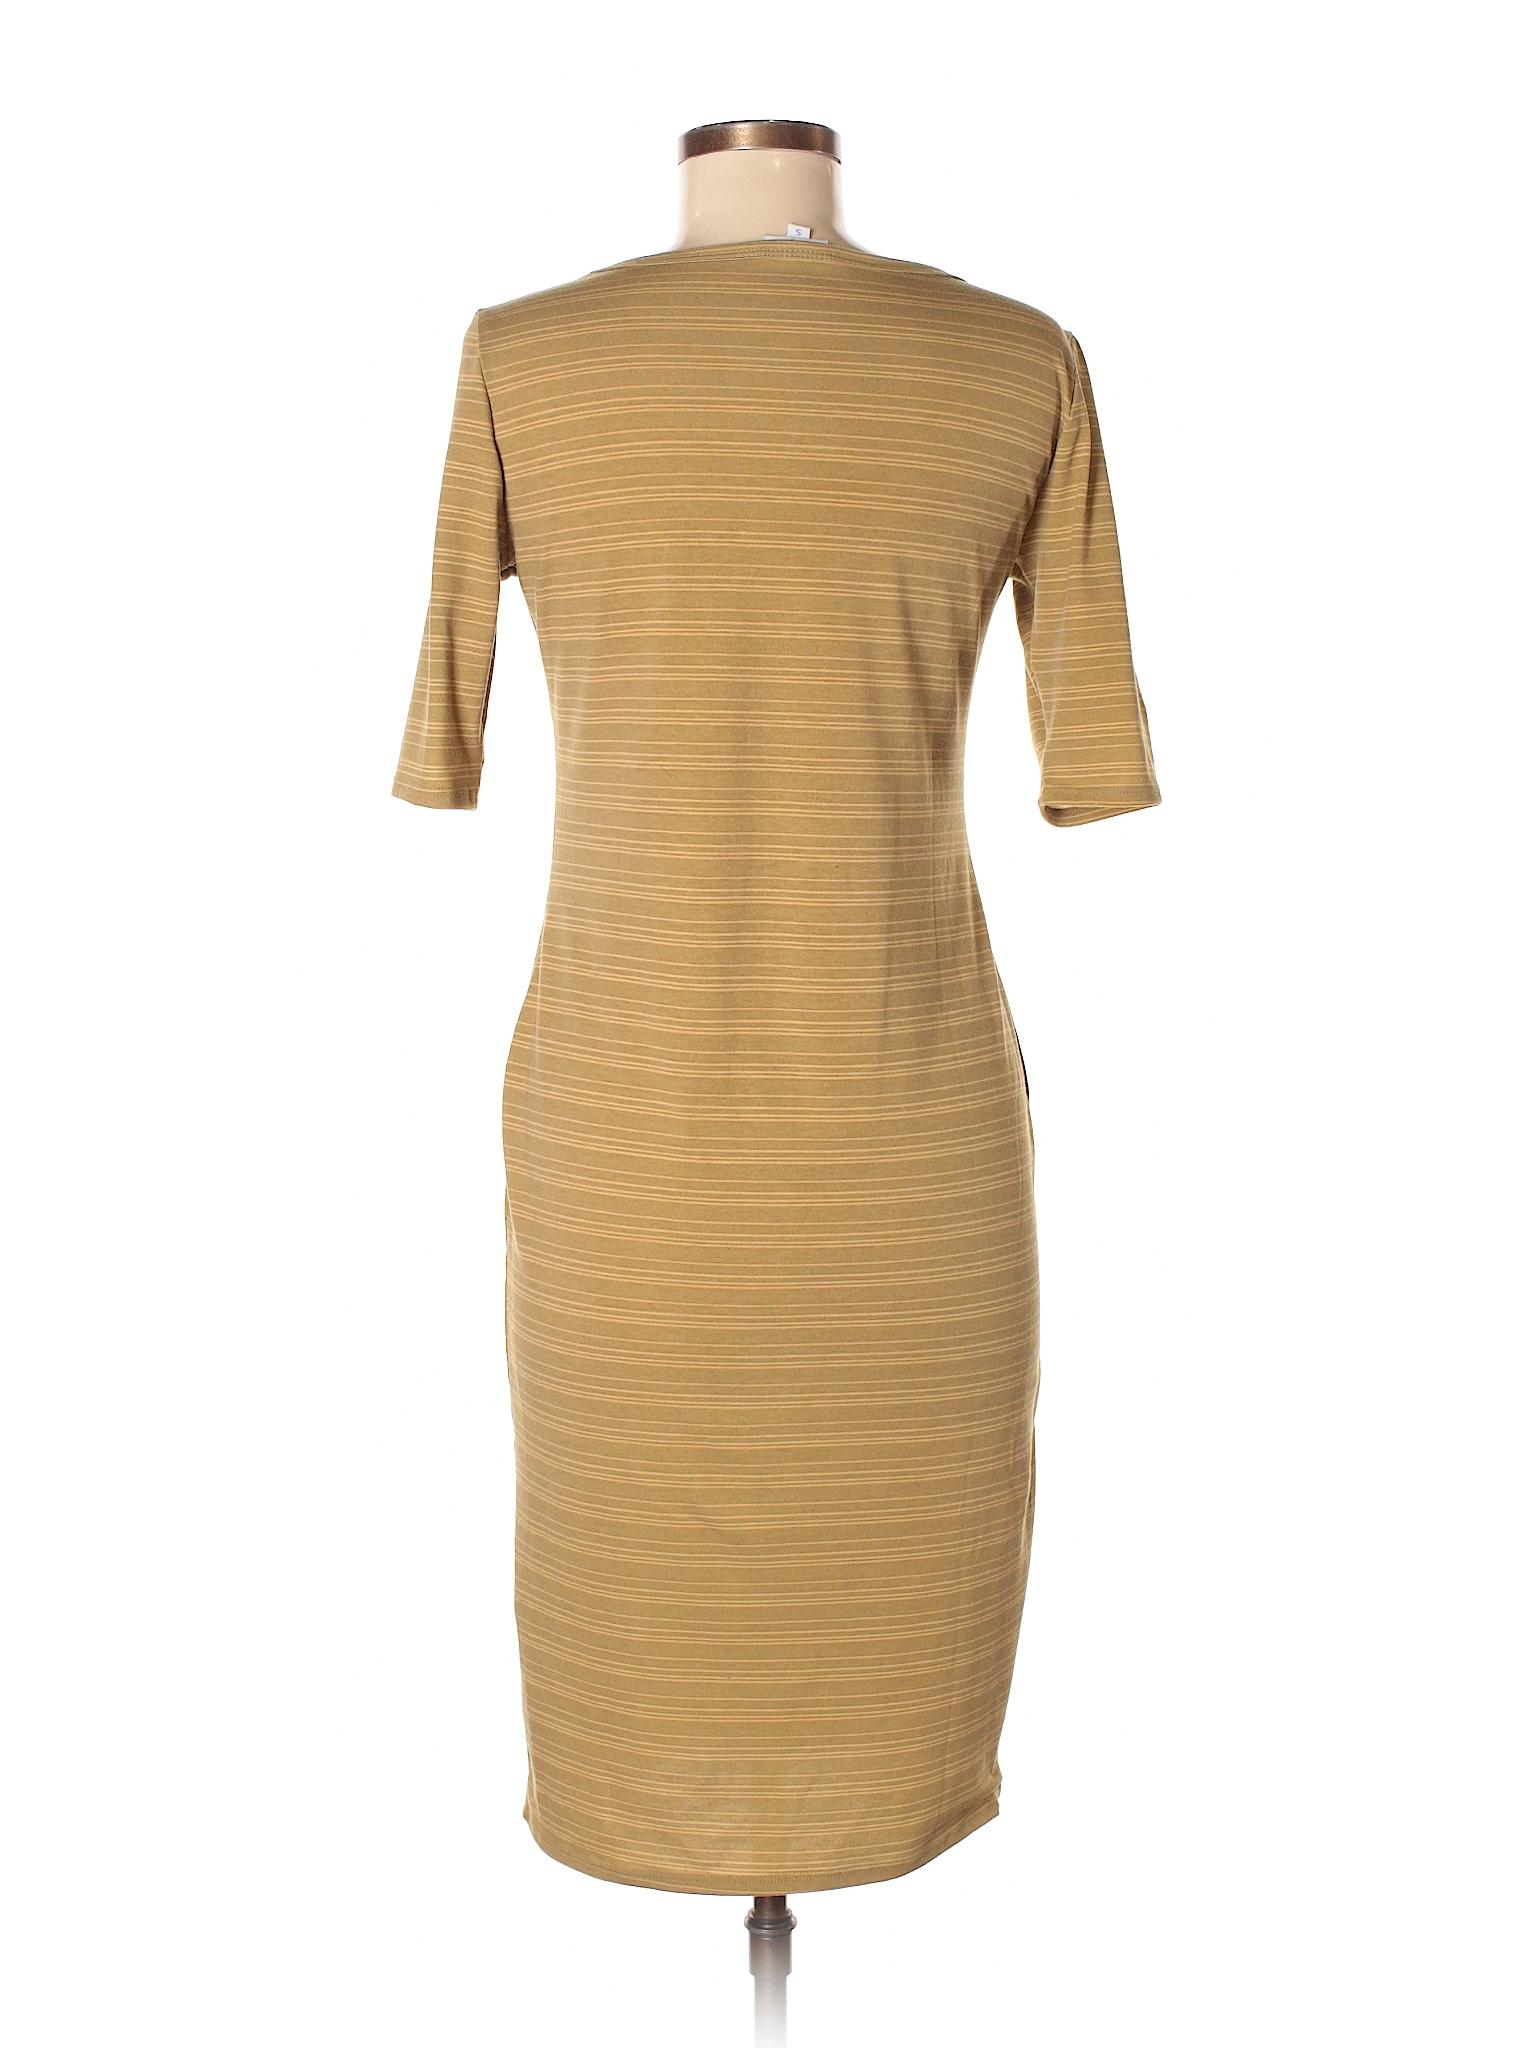 Dress Boutique Boutique Casual winter Lularoe winter PqgqXZwW8